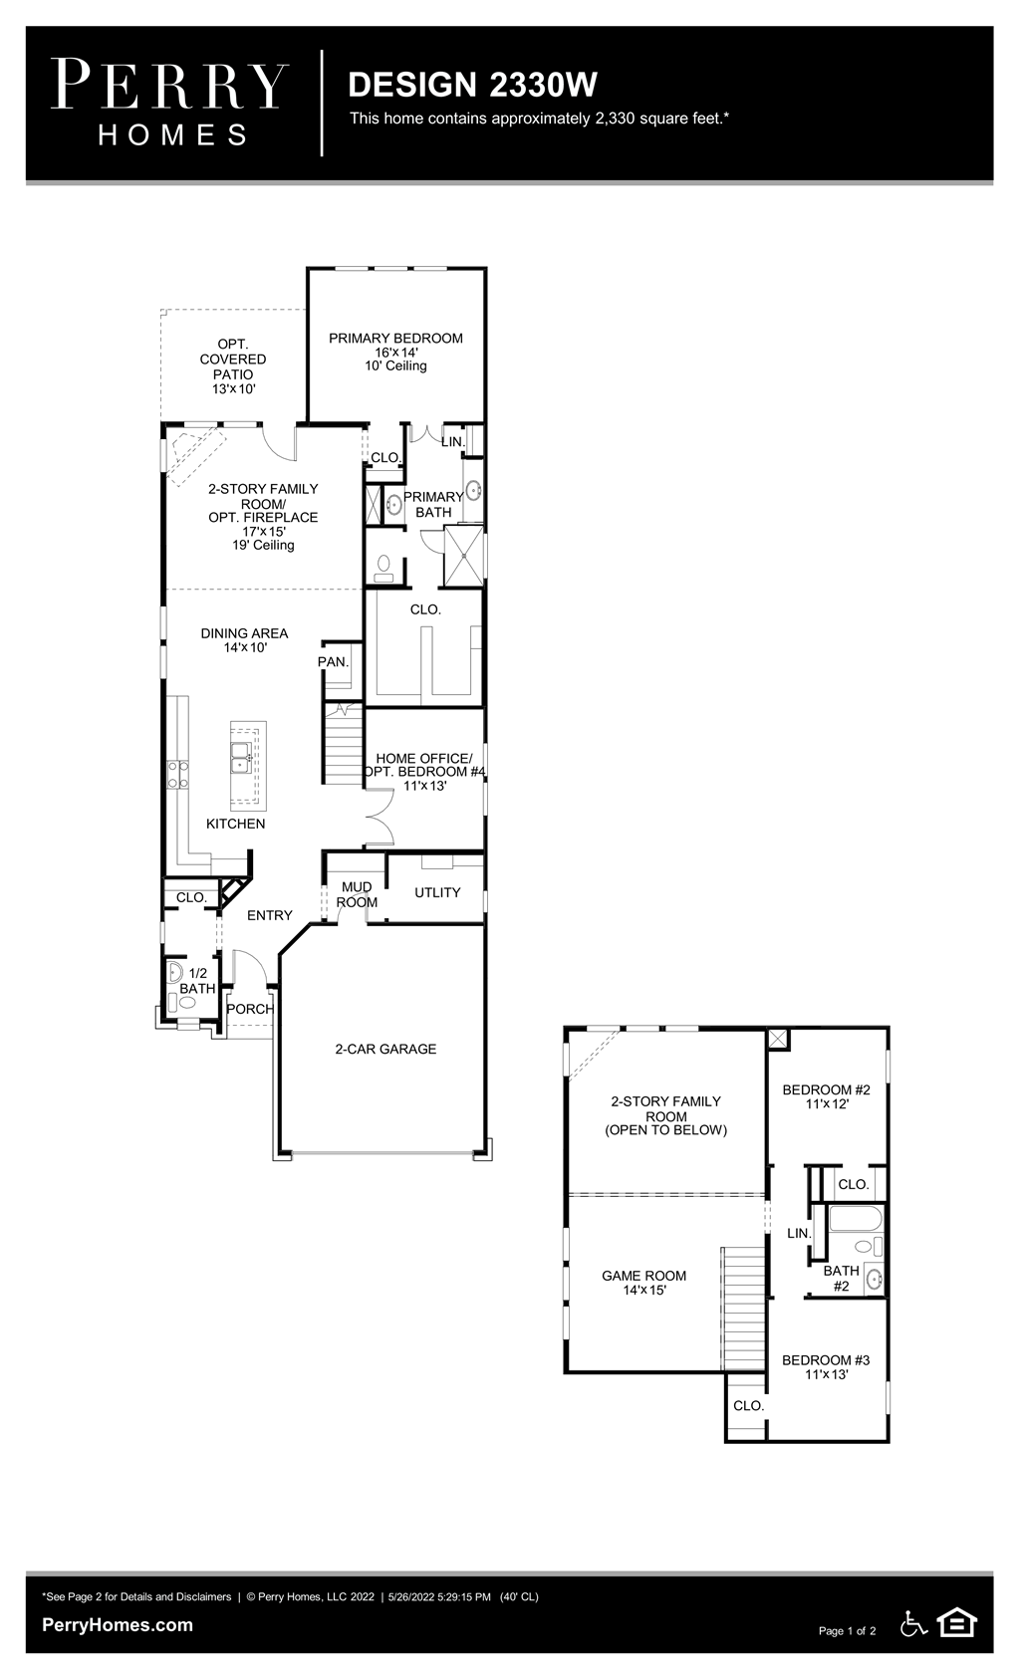 Floor Plan for 2330W